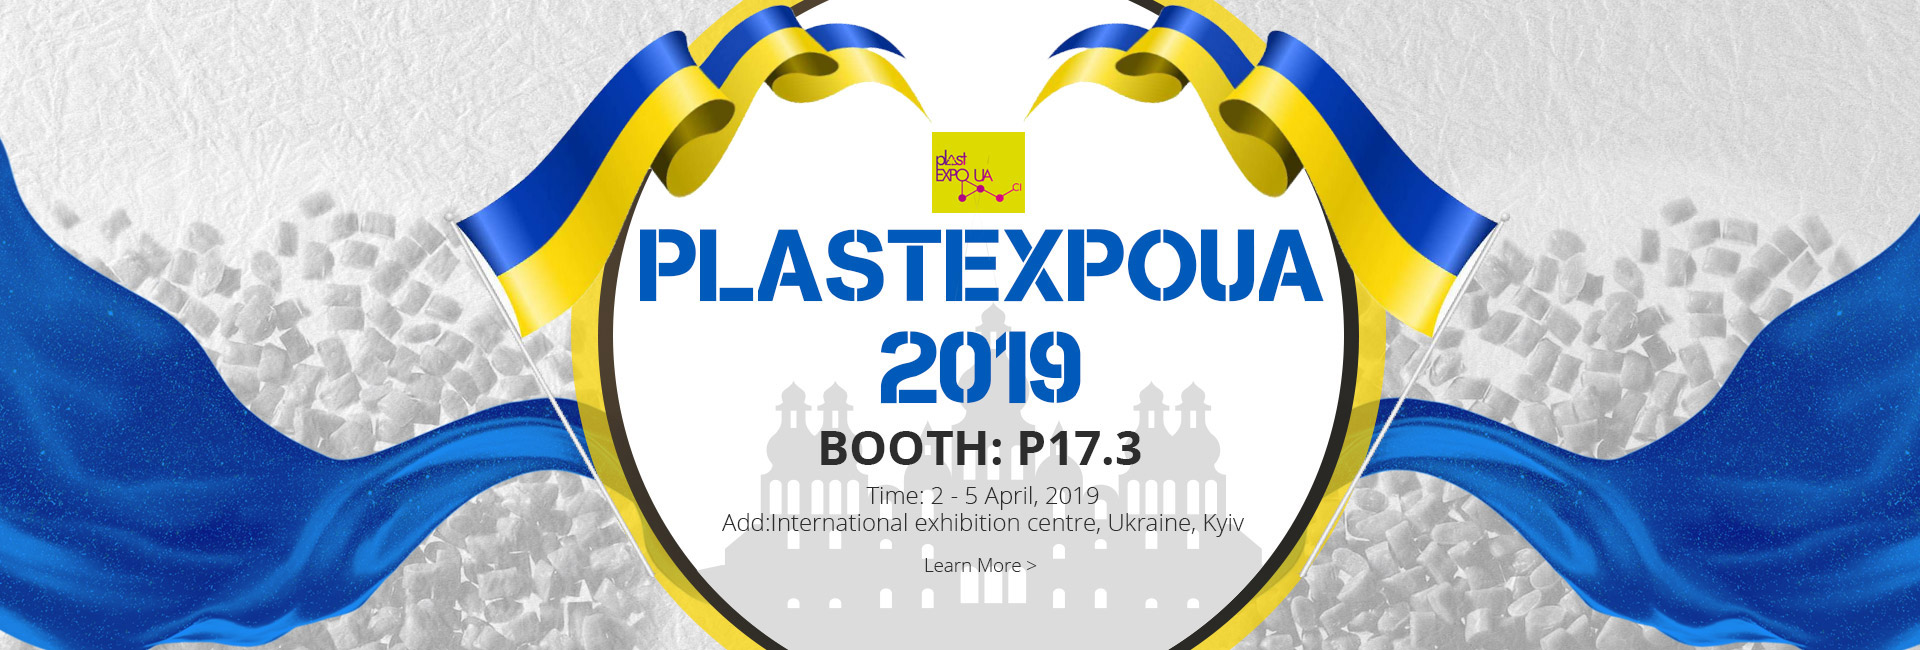 PLASTEXPOUA-2019